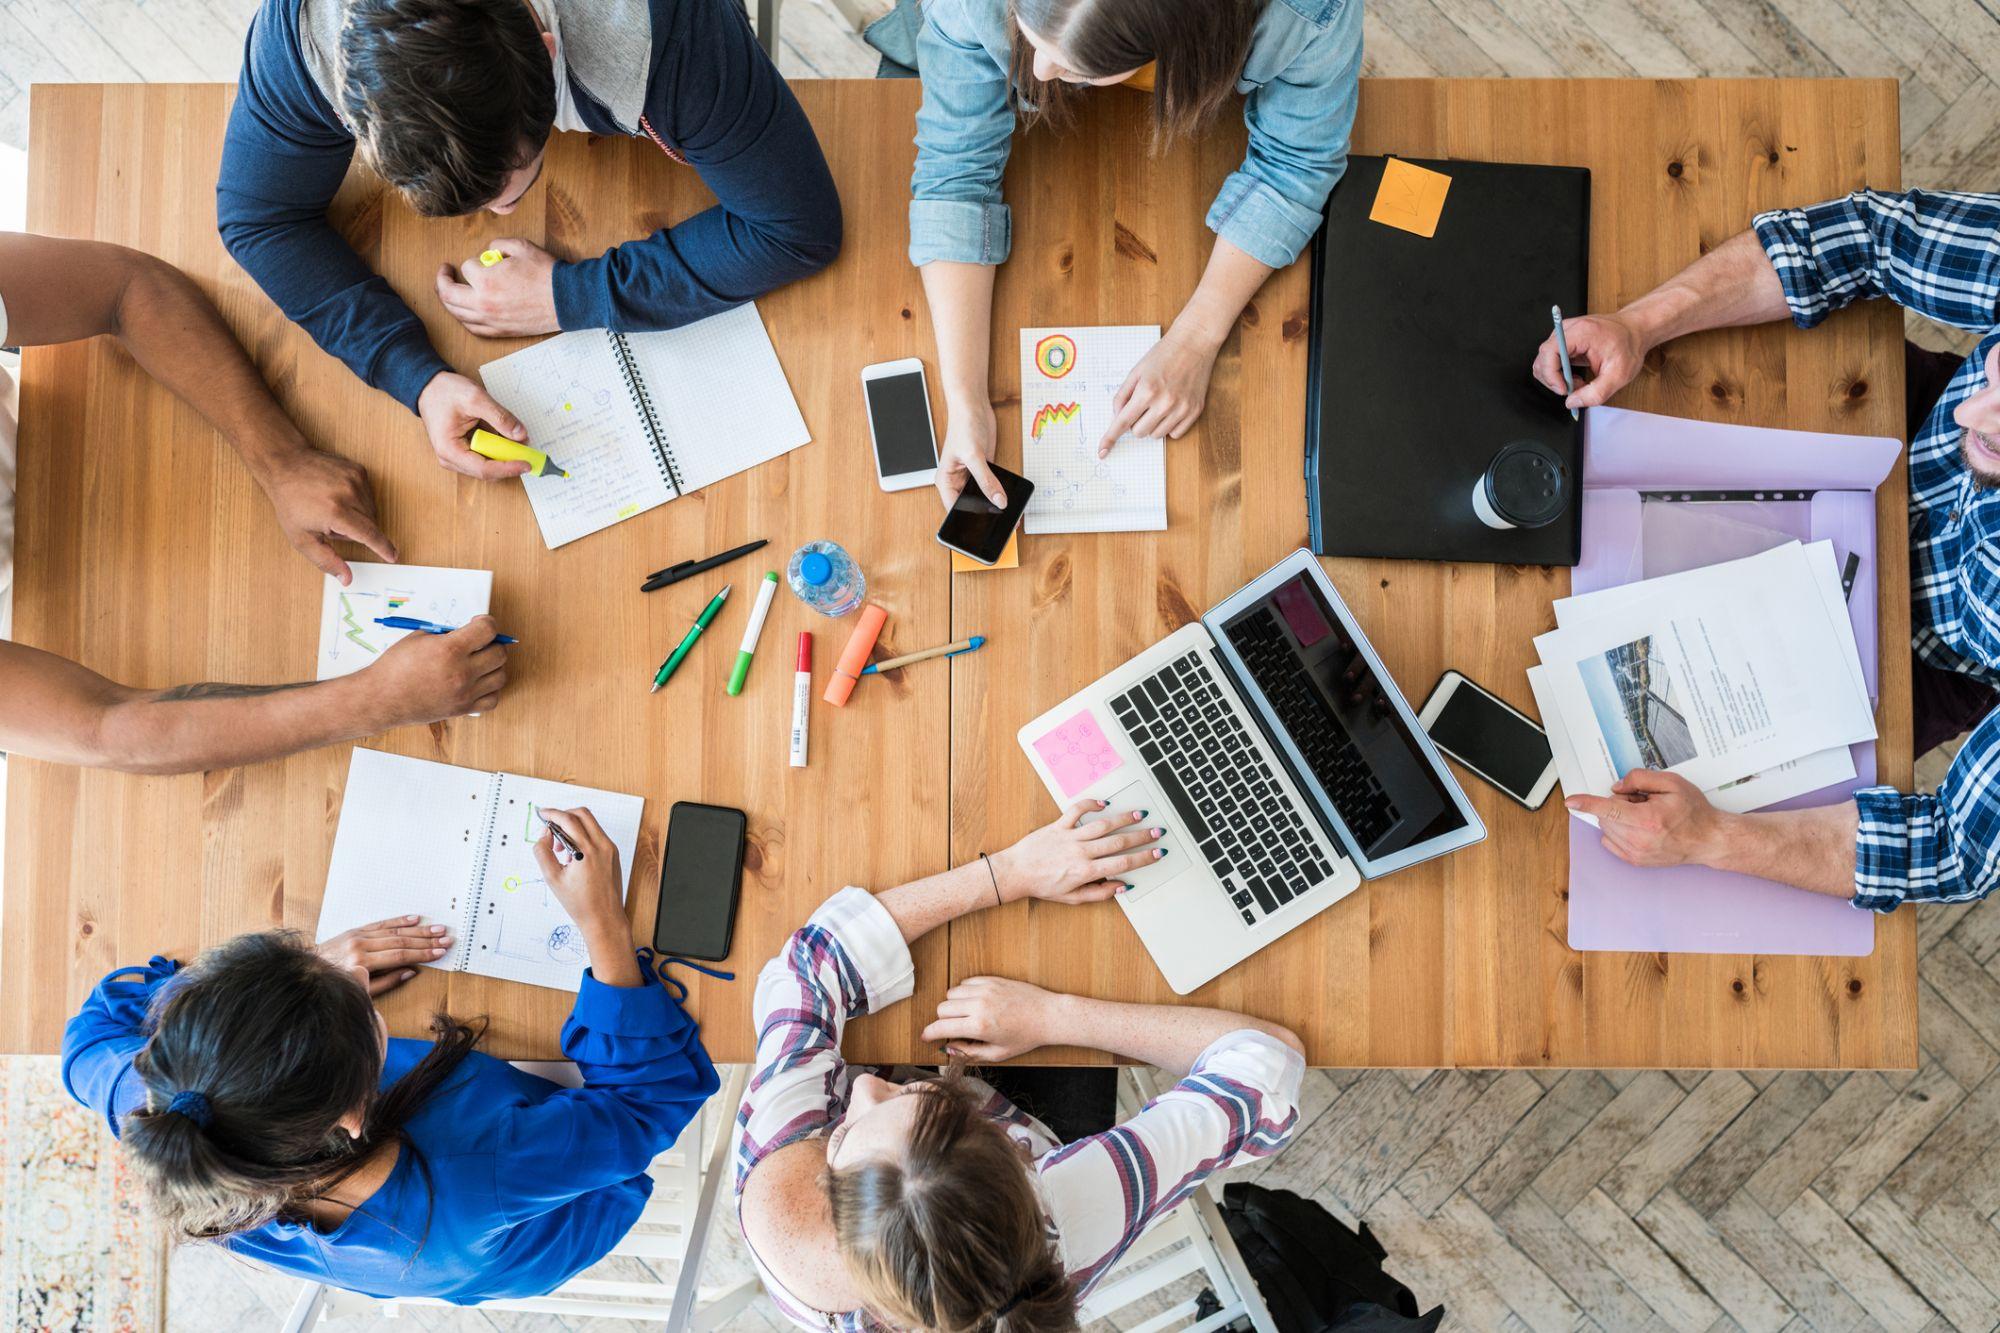 , 5 Effective Low-Budget Marketing Strategies for Startups, Saubio Making Wealth